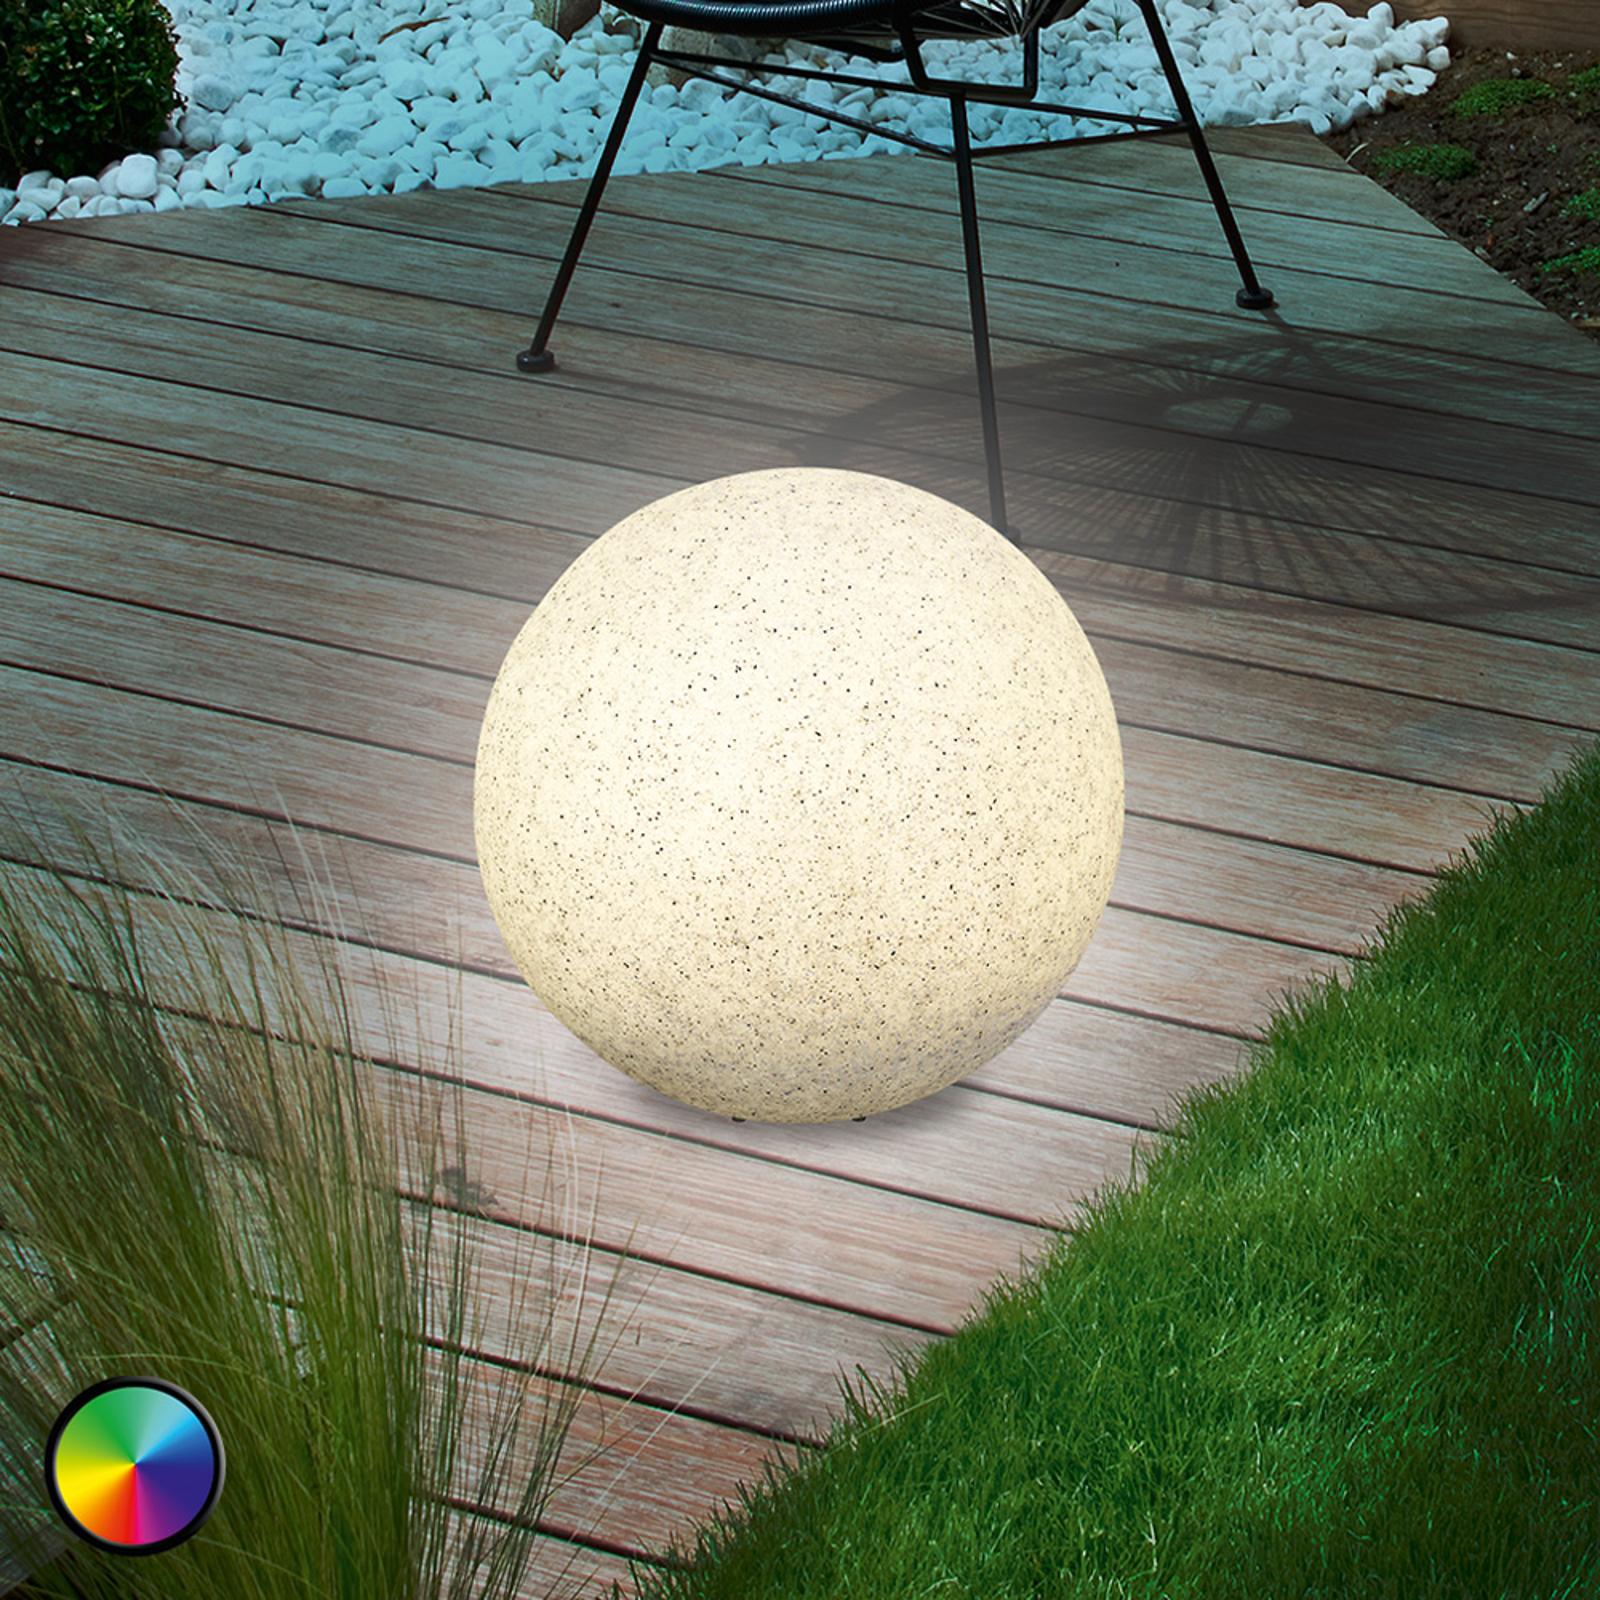 Mega Stone - contemporary LED solar globe light_3012221_1